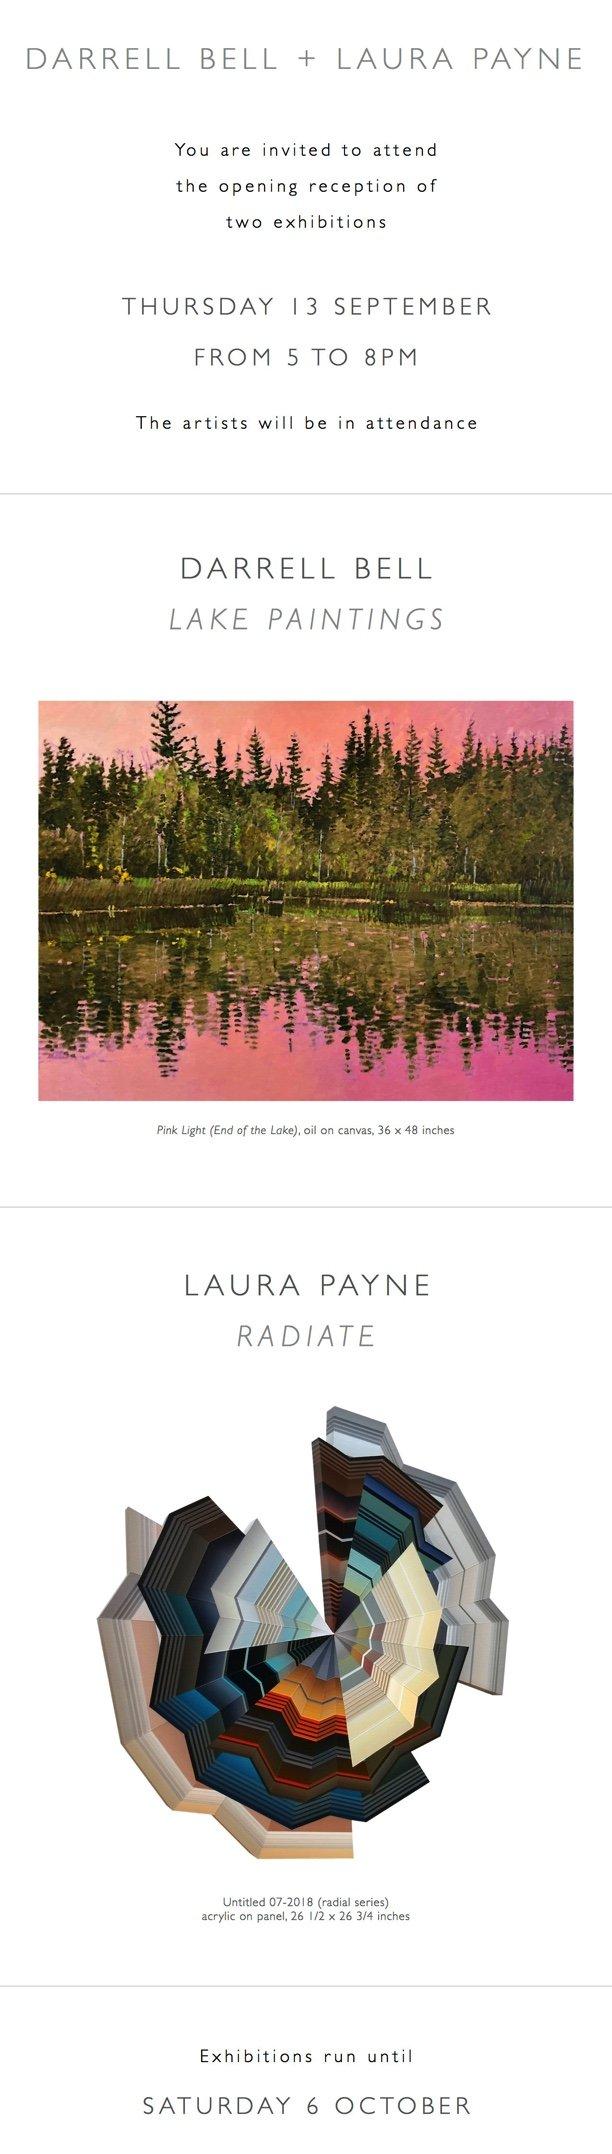 "Darrell Bell, ""Lake Paintings,"" & Laura Payne, ""Radiate,"" 2018"